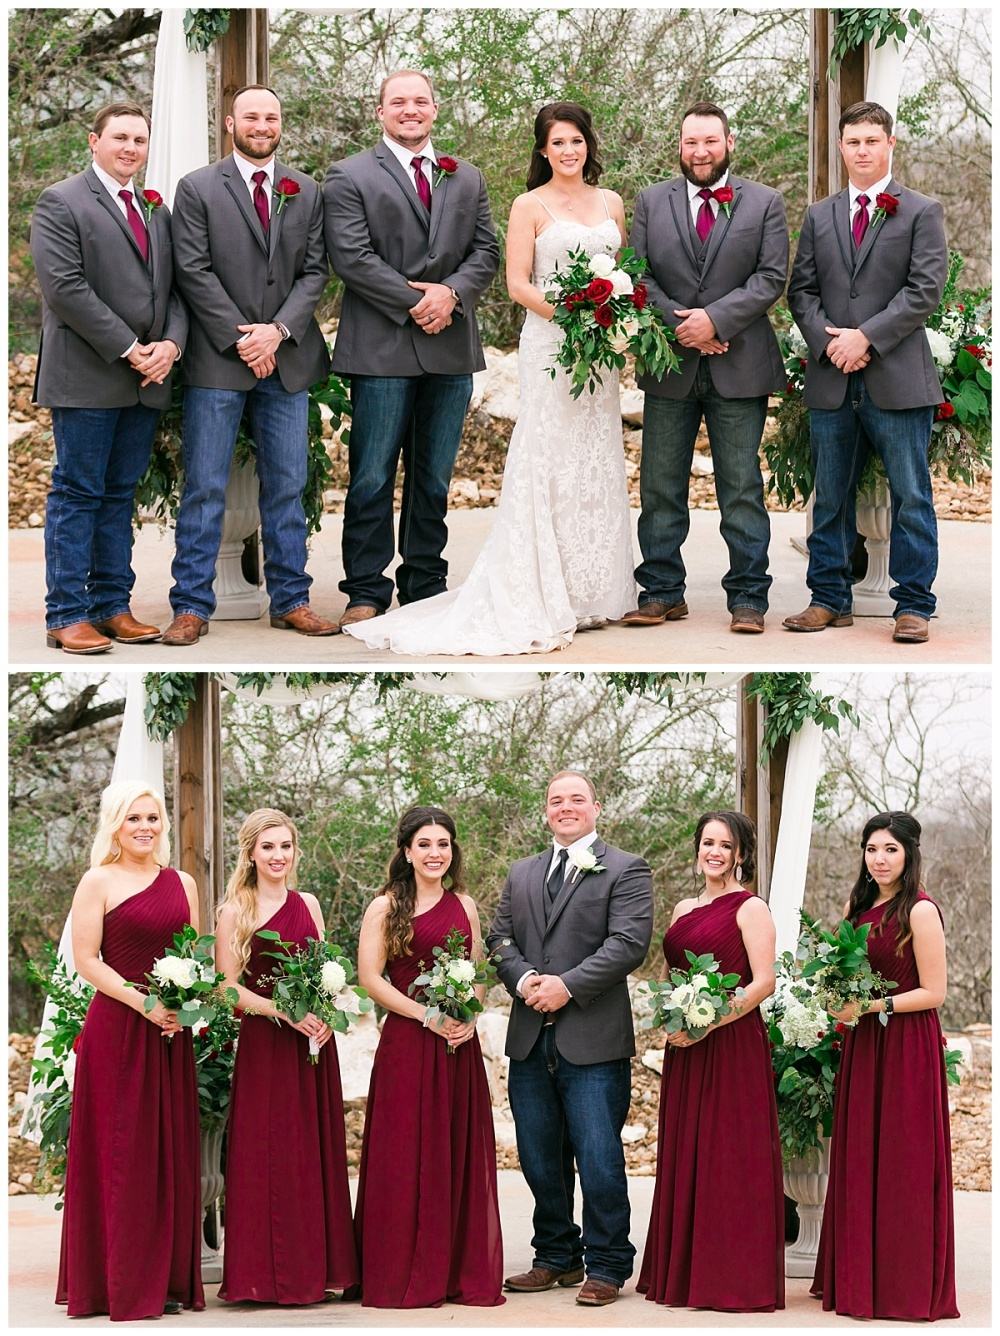 Carly-Barton-Photography-Geronimo-Oaks-Wedding-Venue-Texas-Hill-Country-Ronnie-Sarah_0107.jpg